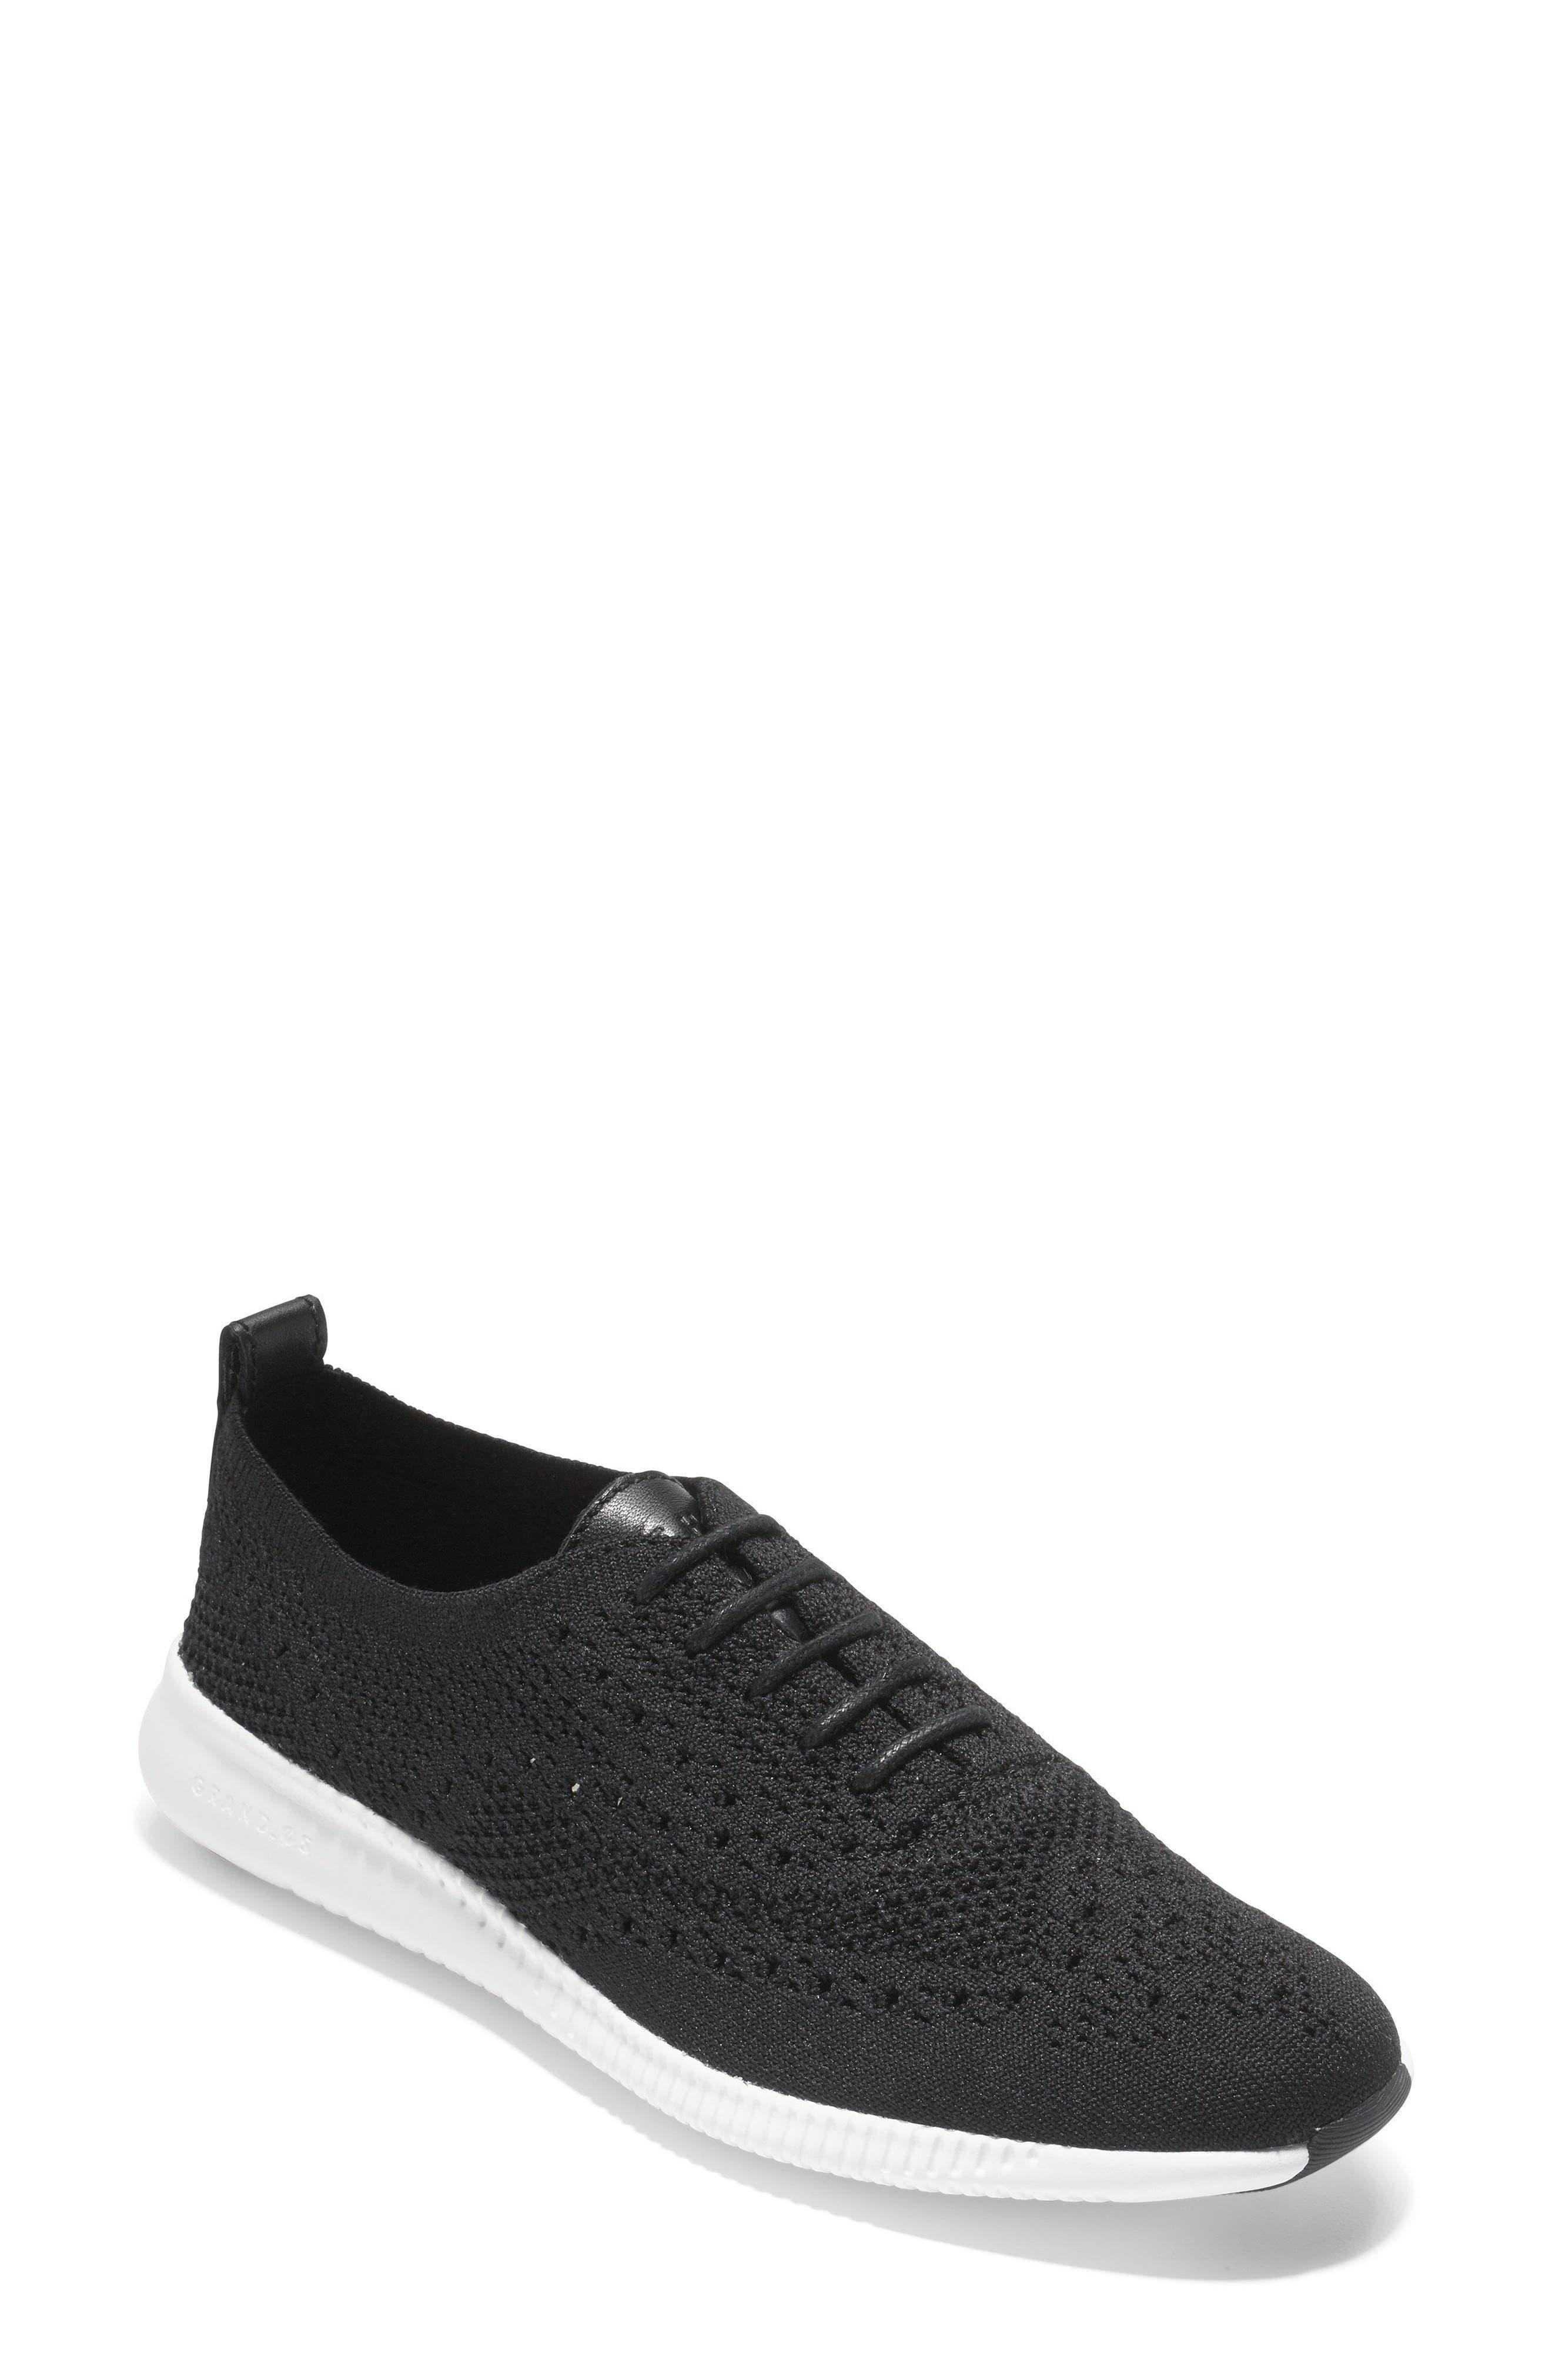 2.ZERØGRAND Stitchlite Wingtip Sneaker,                         Main,                         color, 001